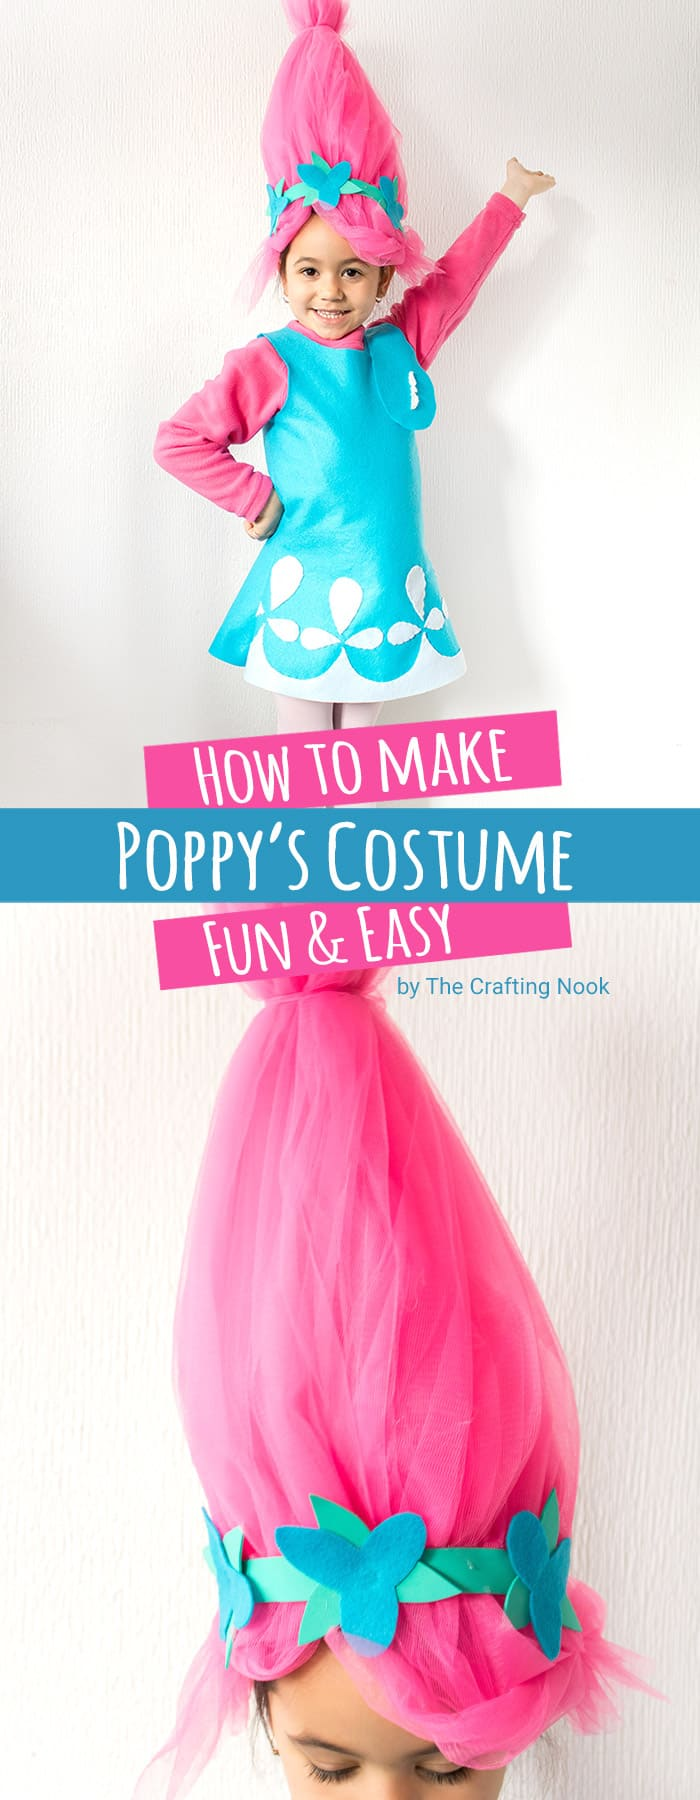 How to Make Troll's Poppy Costume